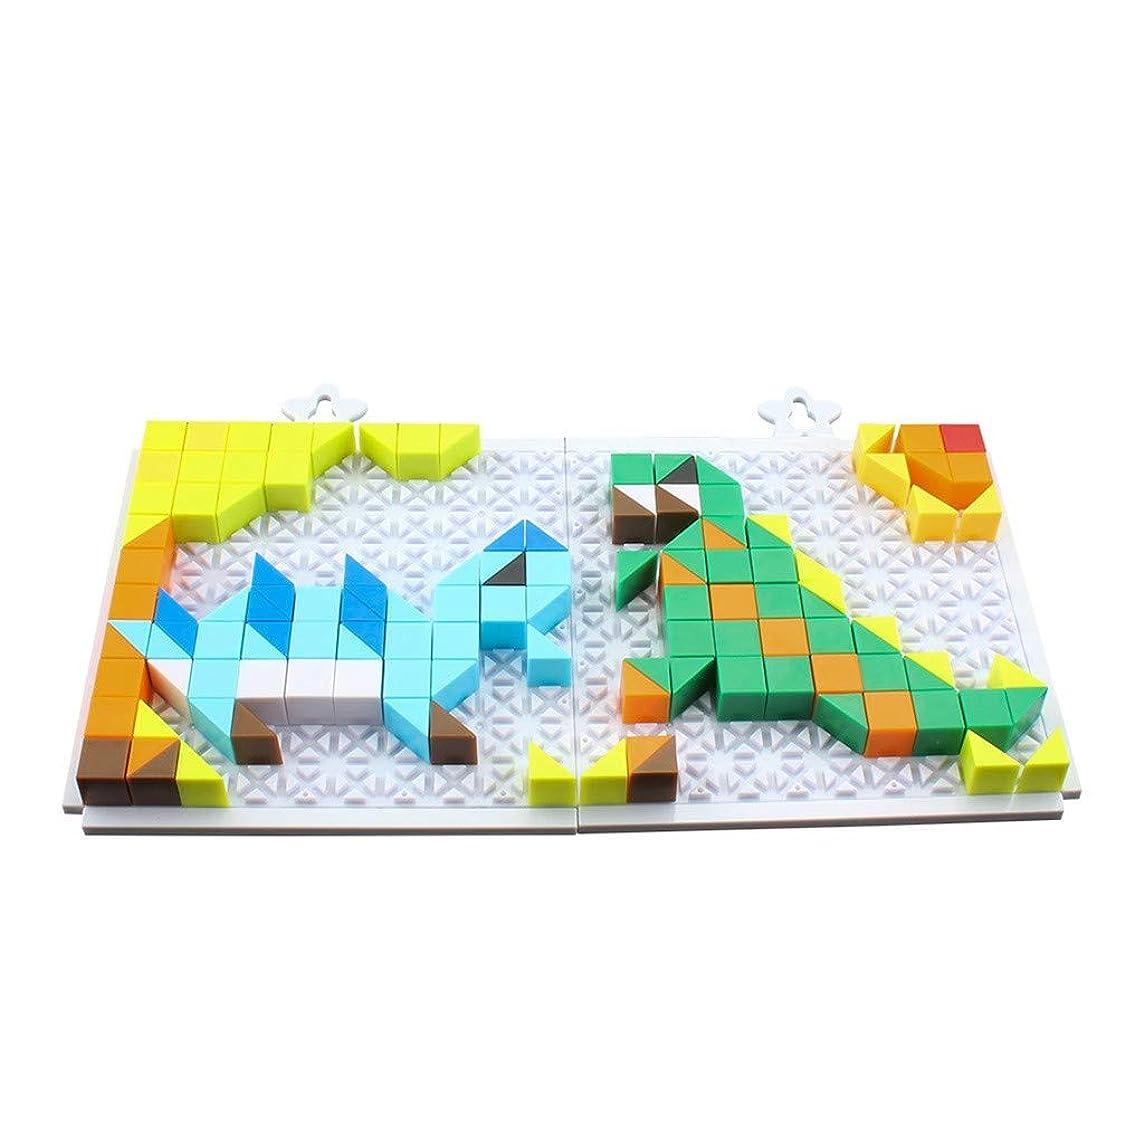 Binory Classic Plastic Pattern Puzzle Bricks Set, DIY Geometric Manipulative Shape Building Blocks,Multi-Color Montessori Early Educational Toy Birthday Gift for Preschool Toddlers